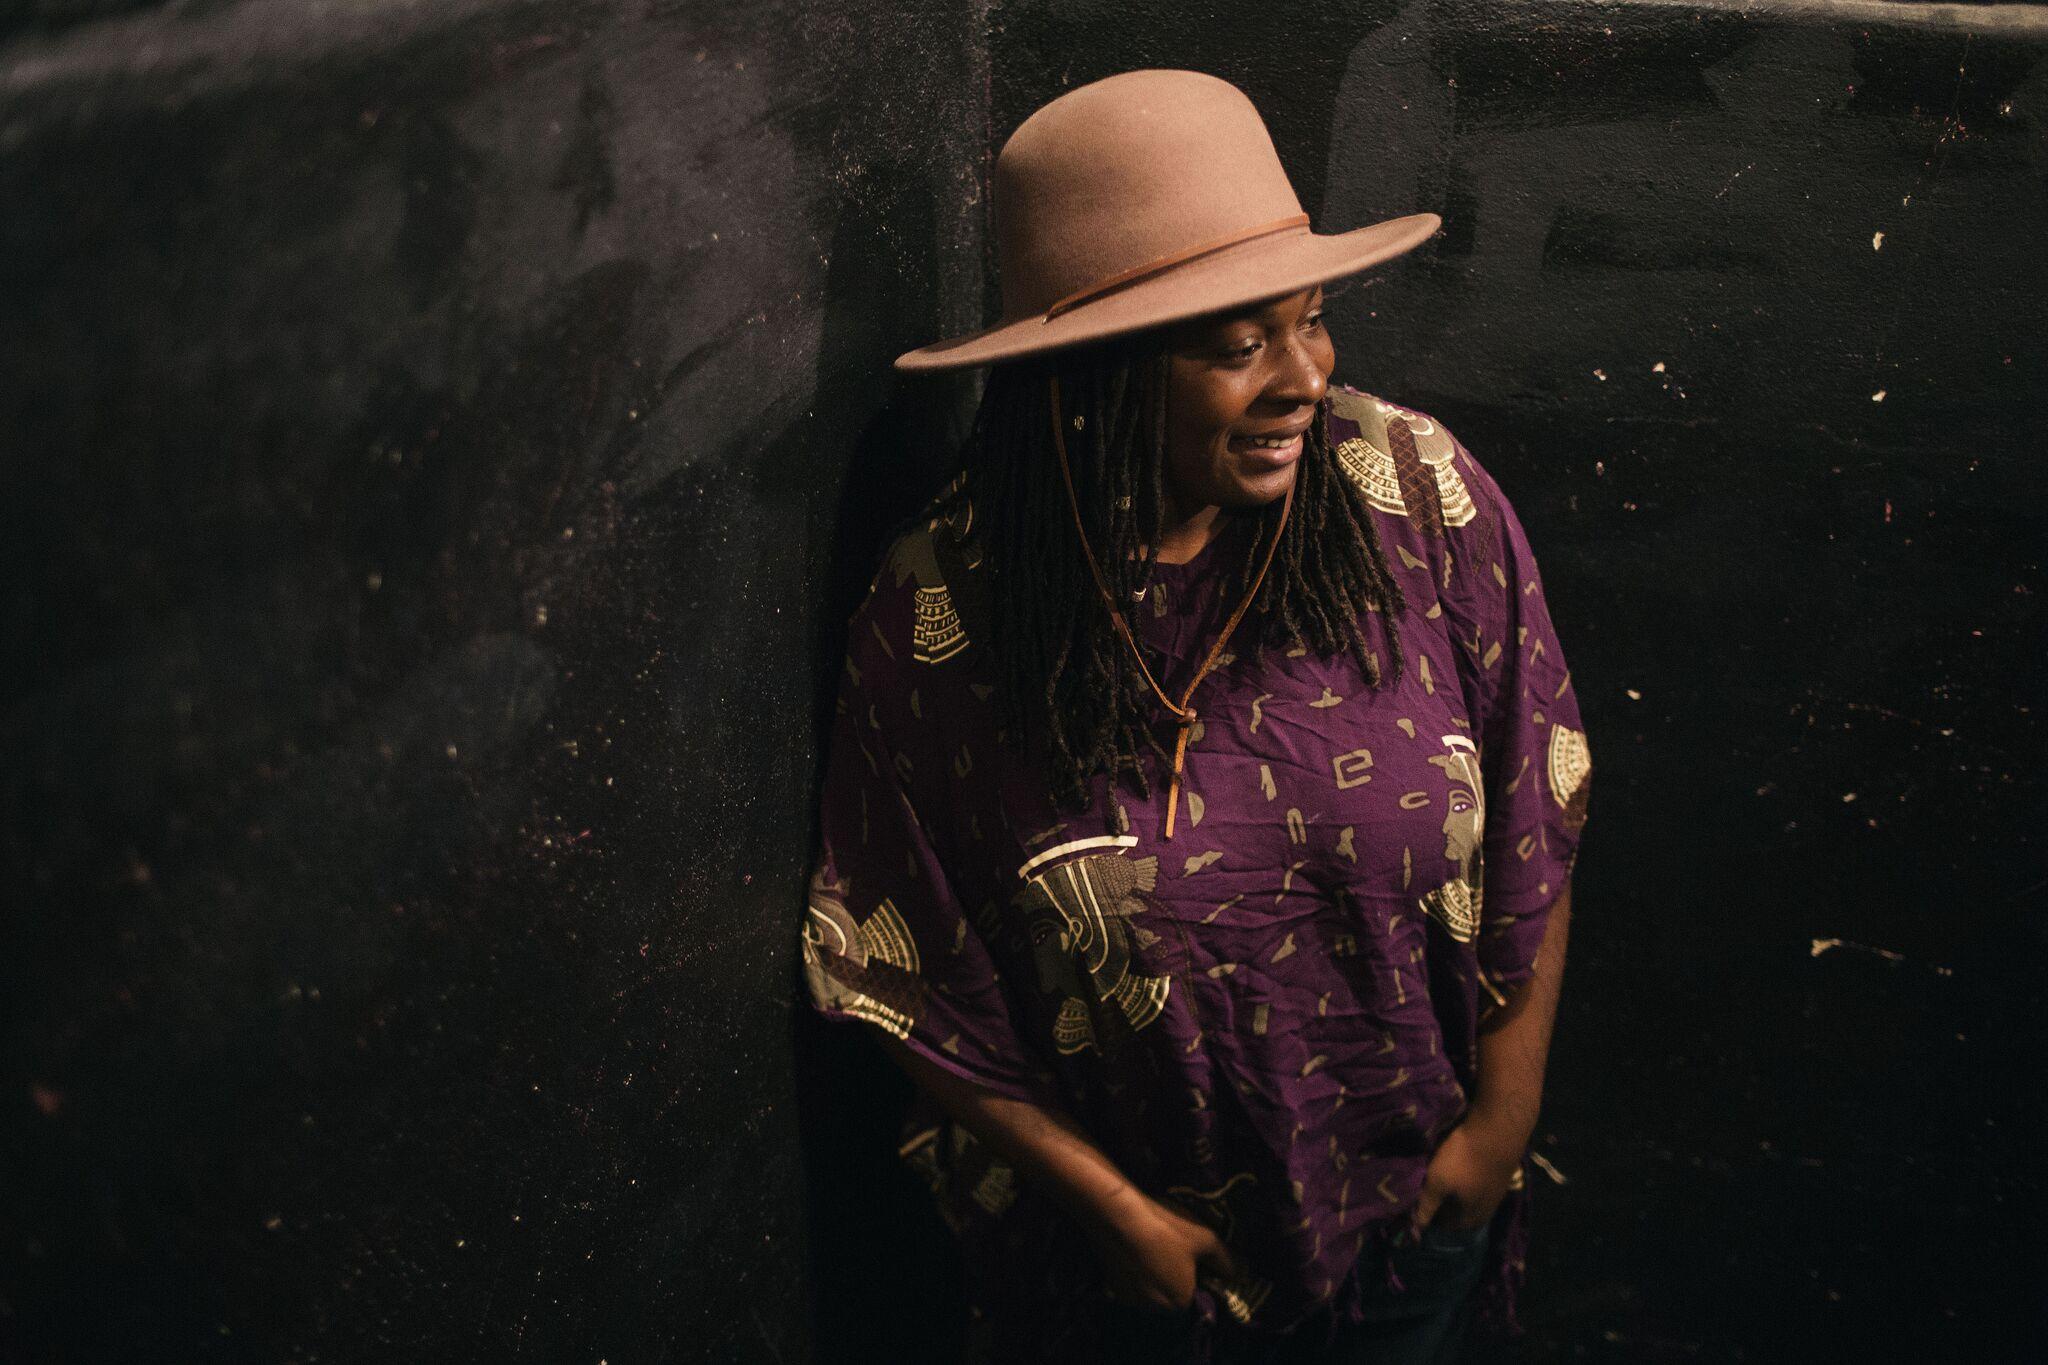 Tiffany Gouché photographed by Marlin Munoz